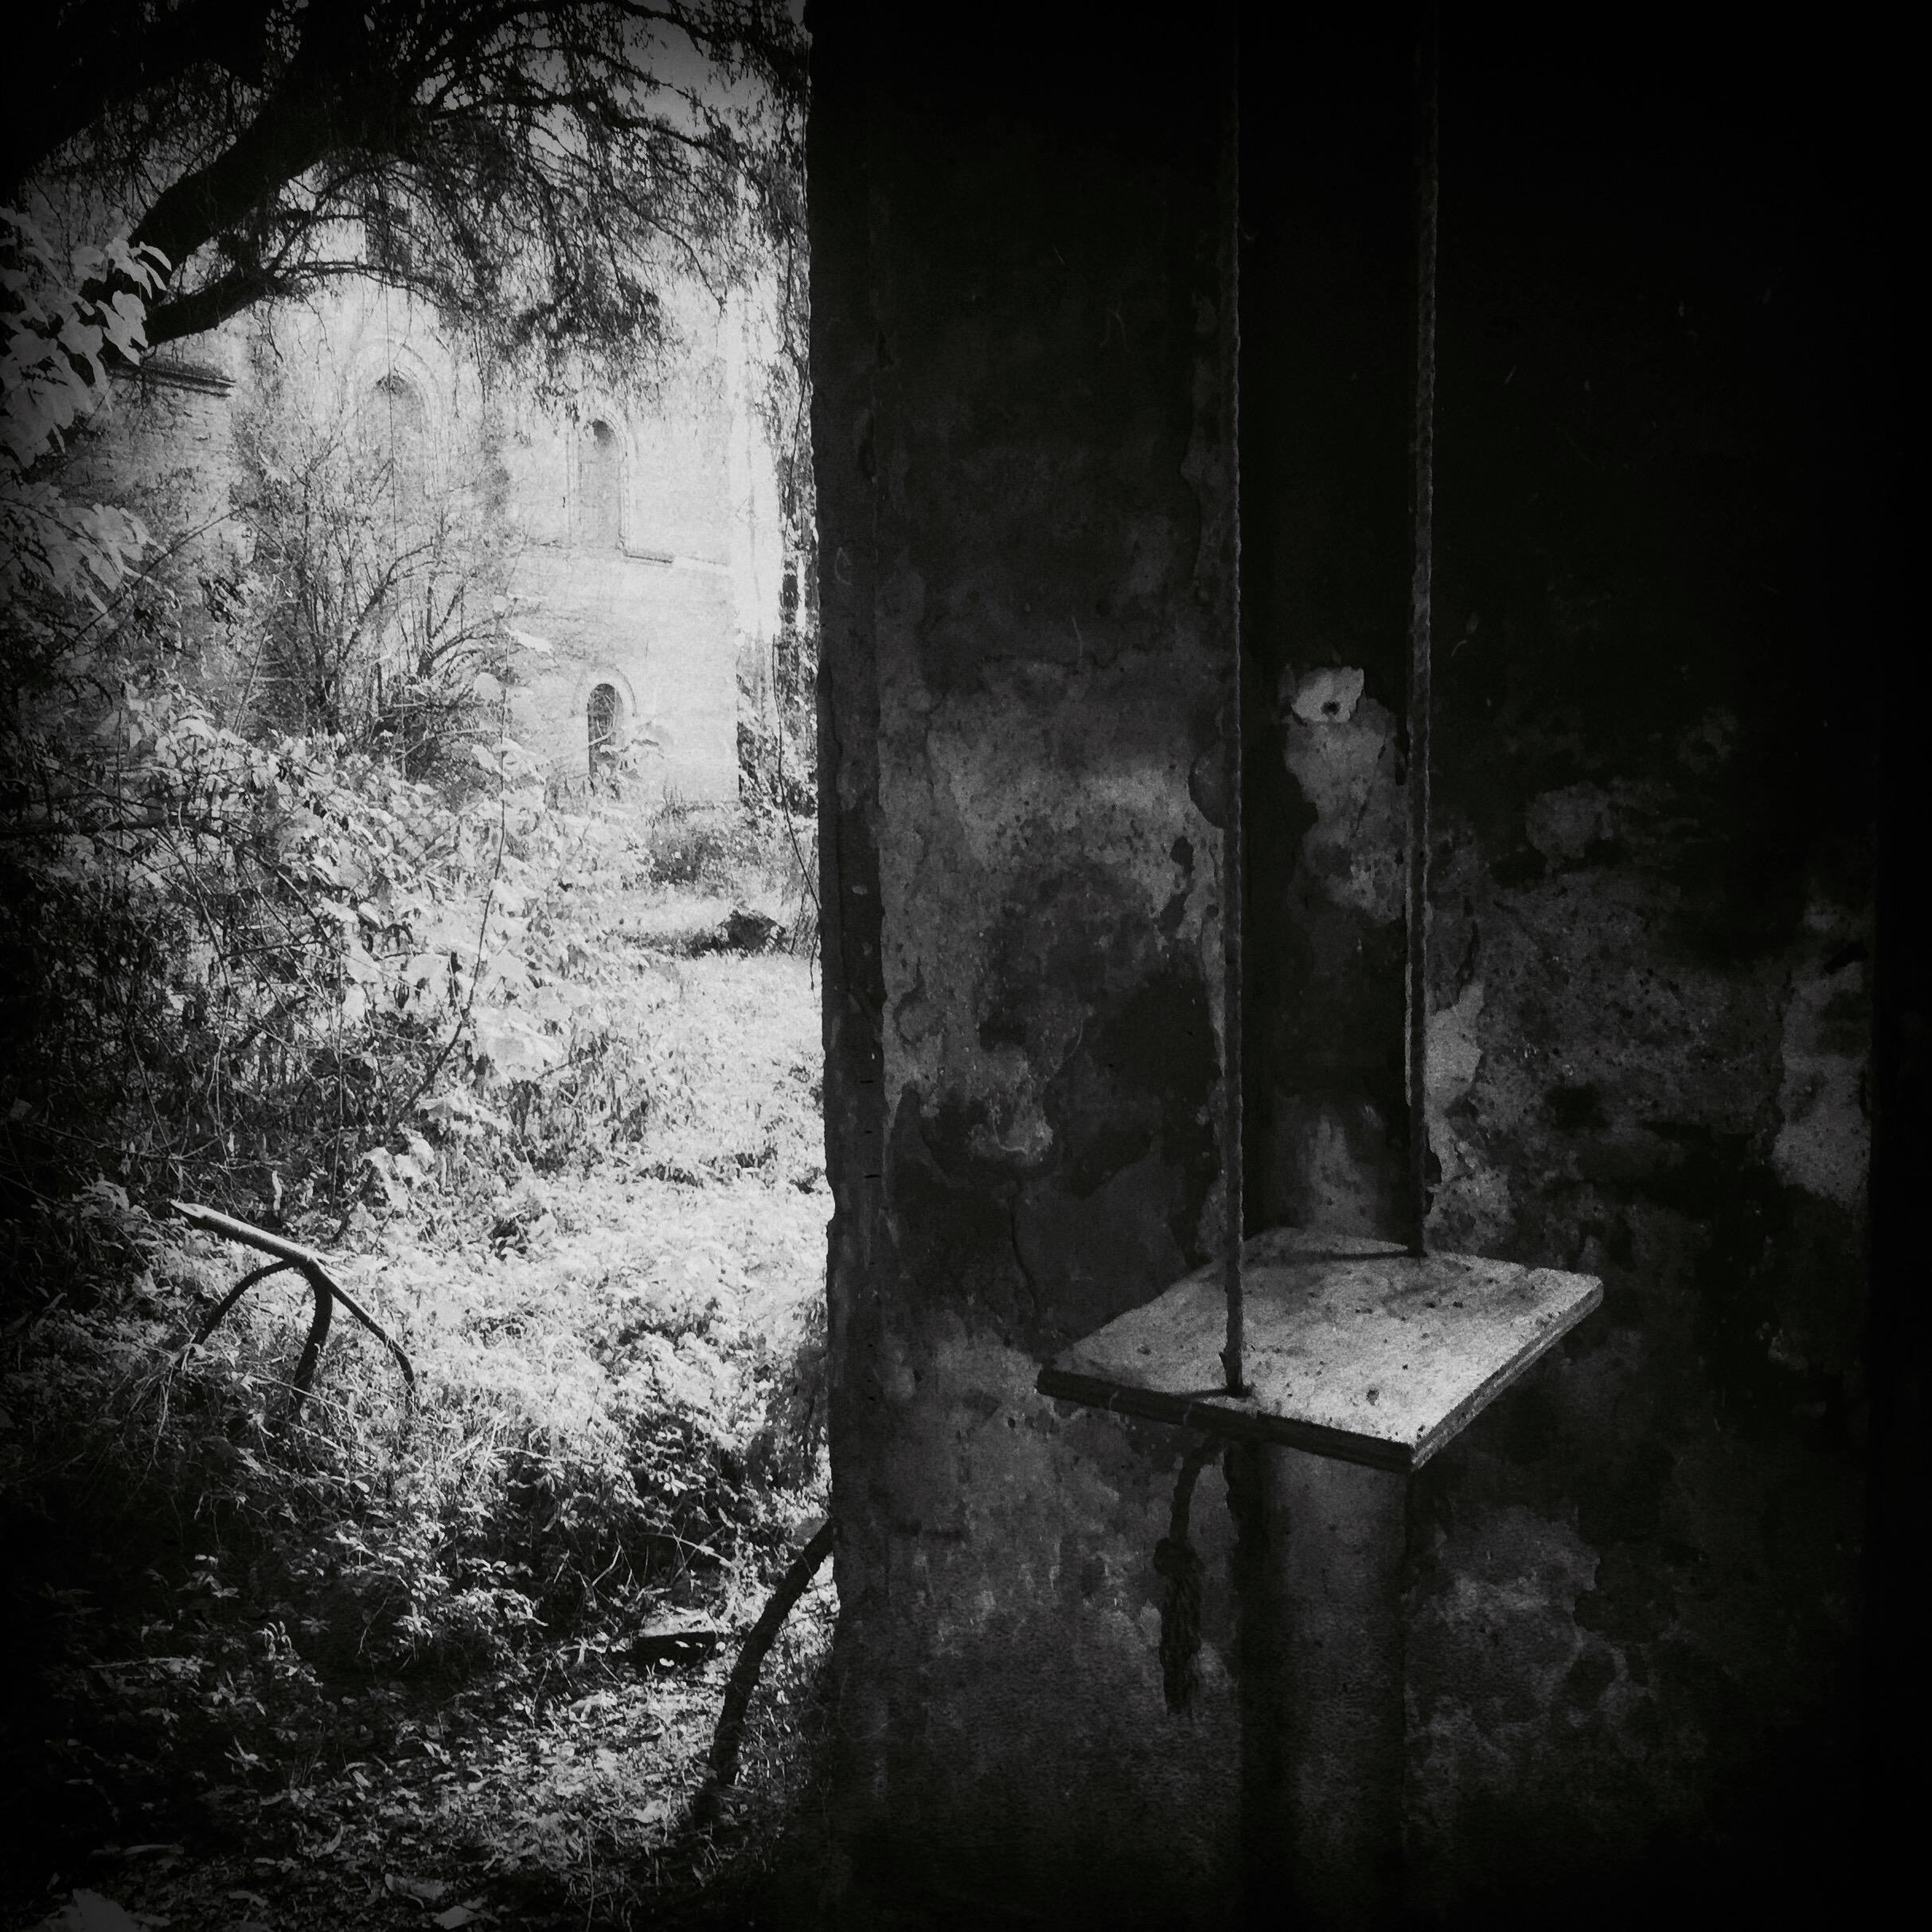 Federica Corbelli ~ Swing into never never land